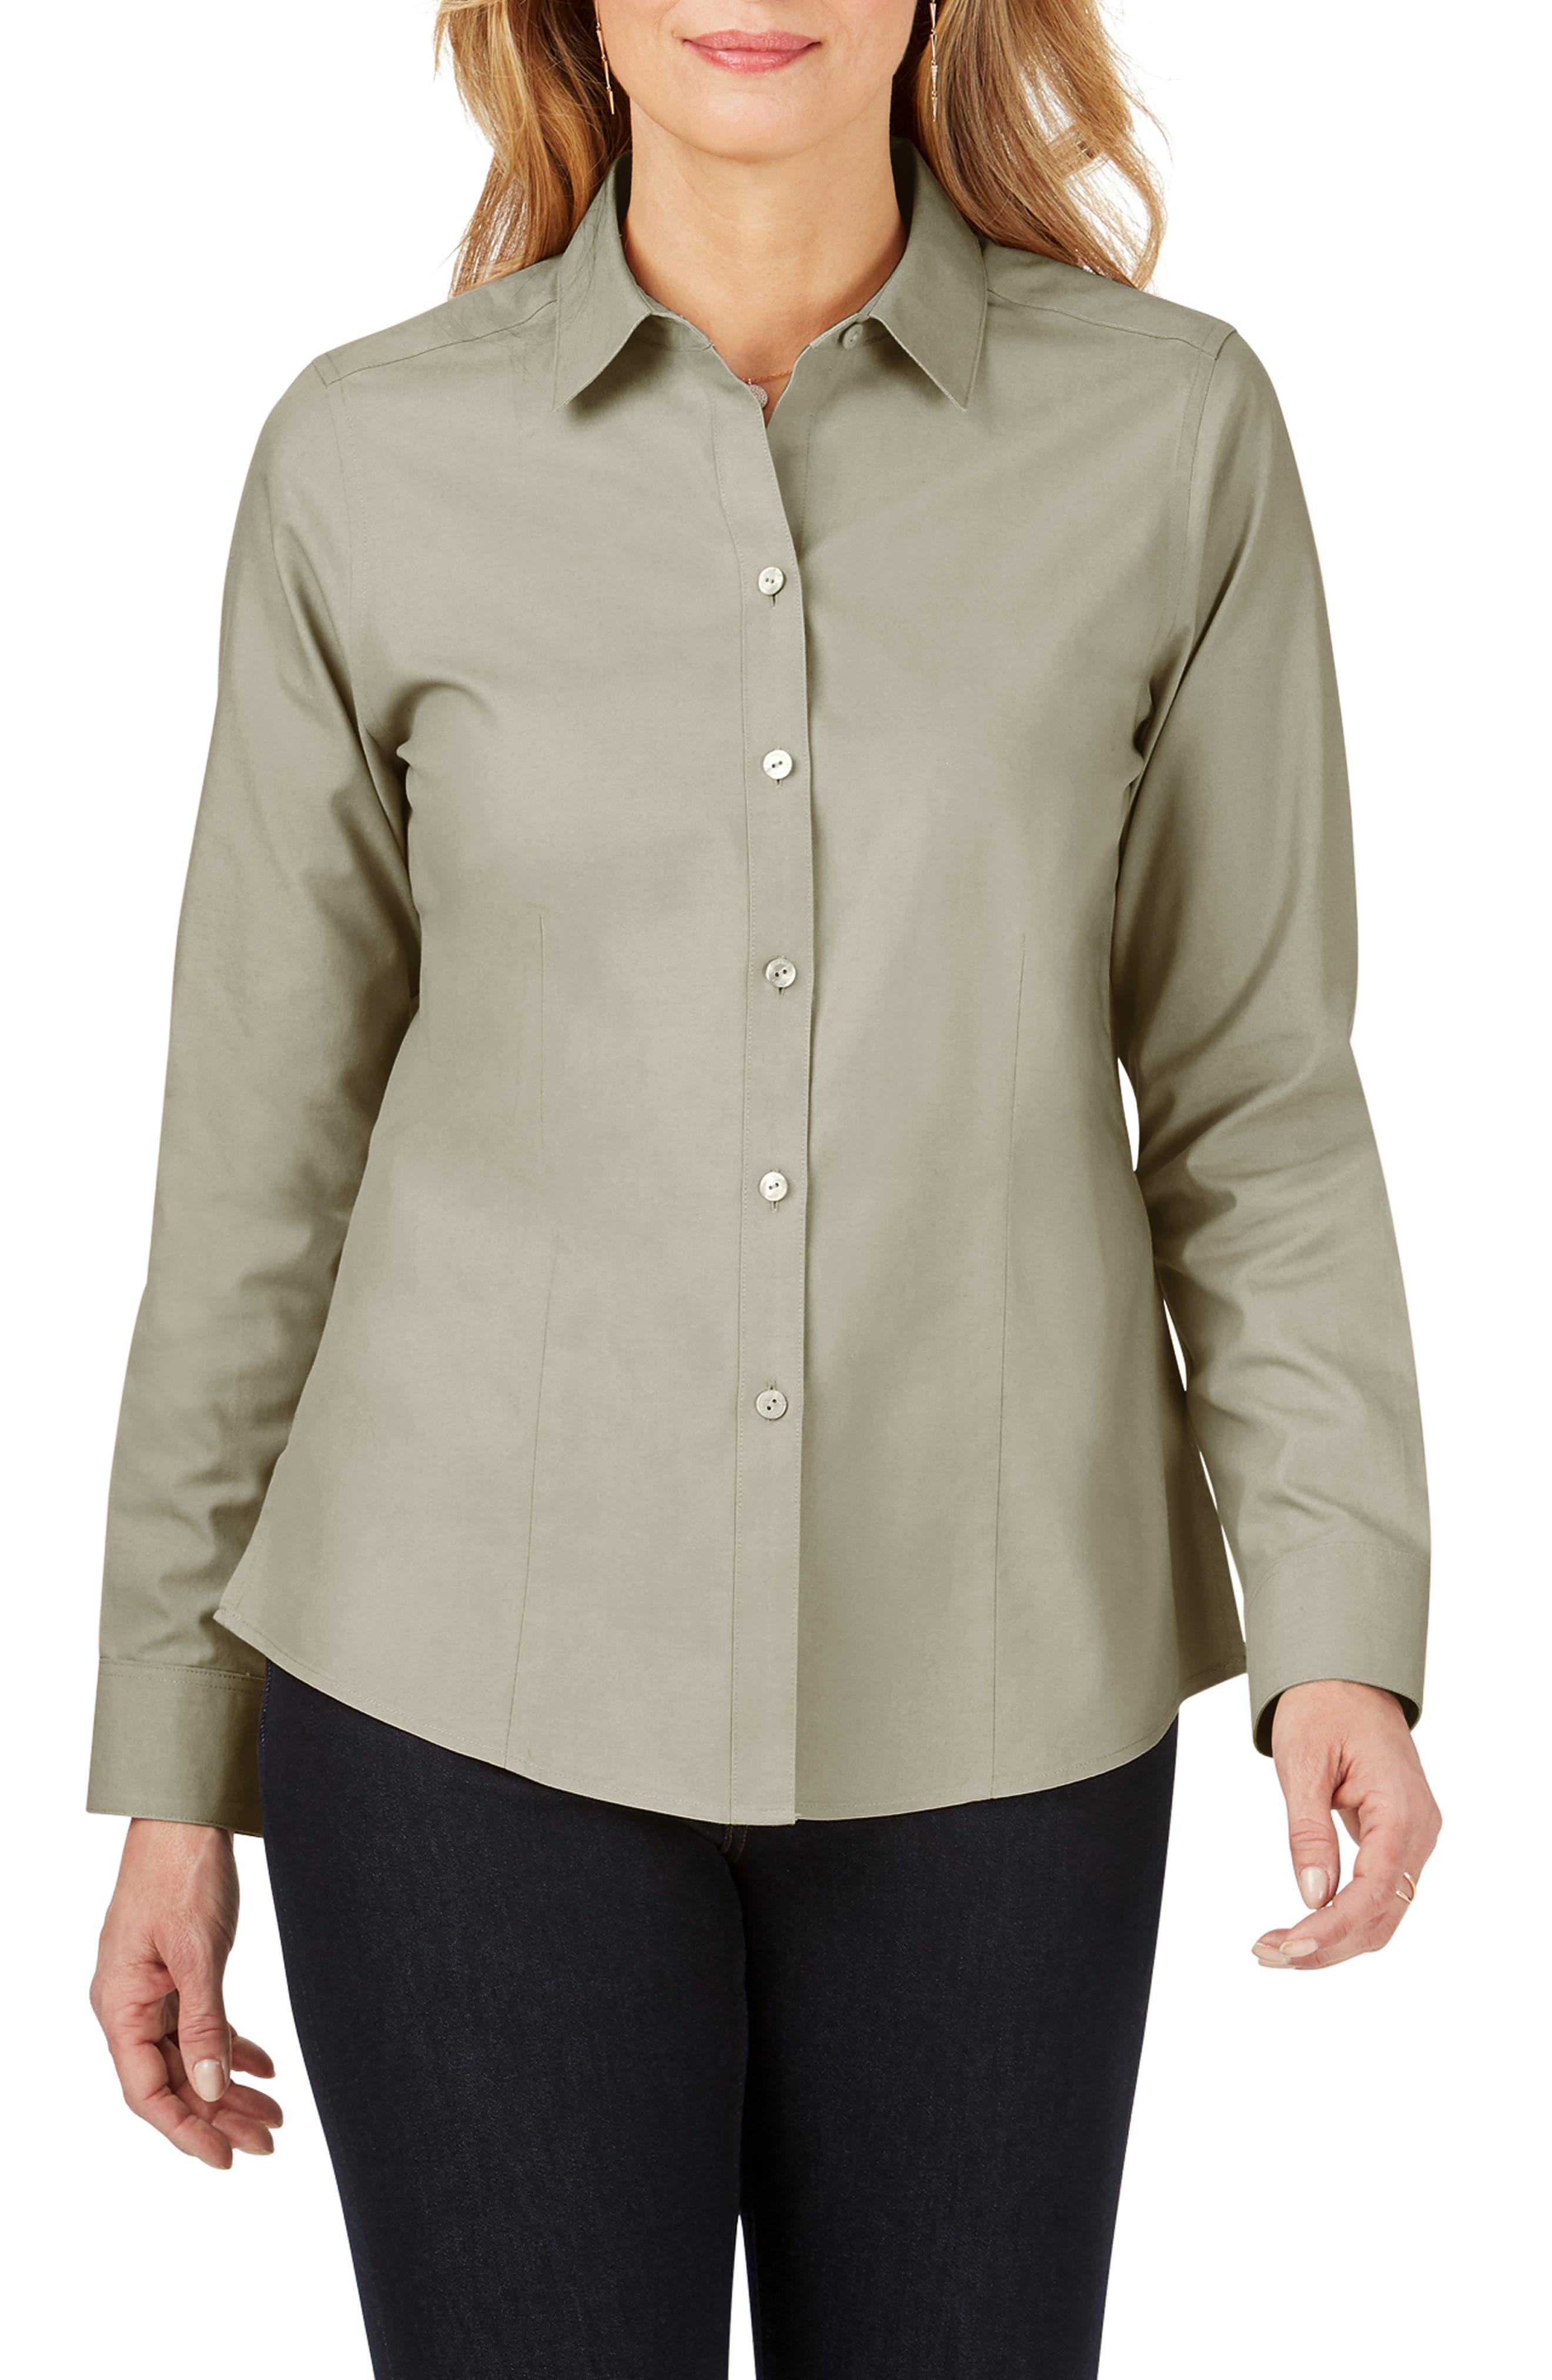 Dianna Non-Iron Cotton Shirt